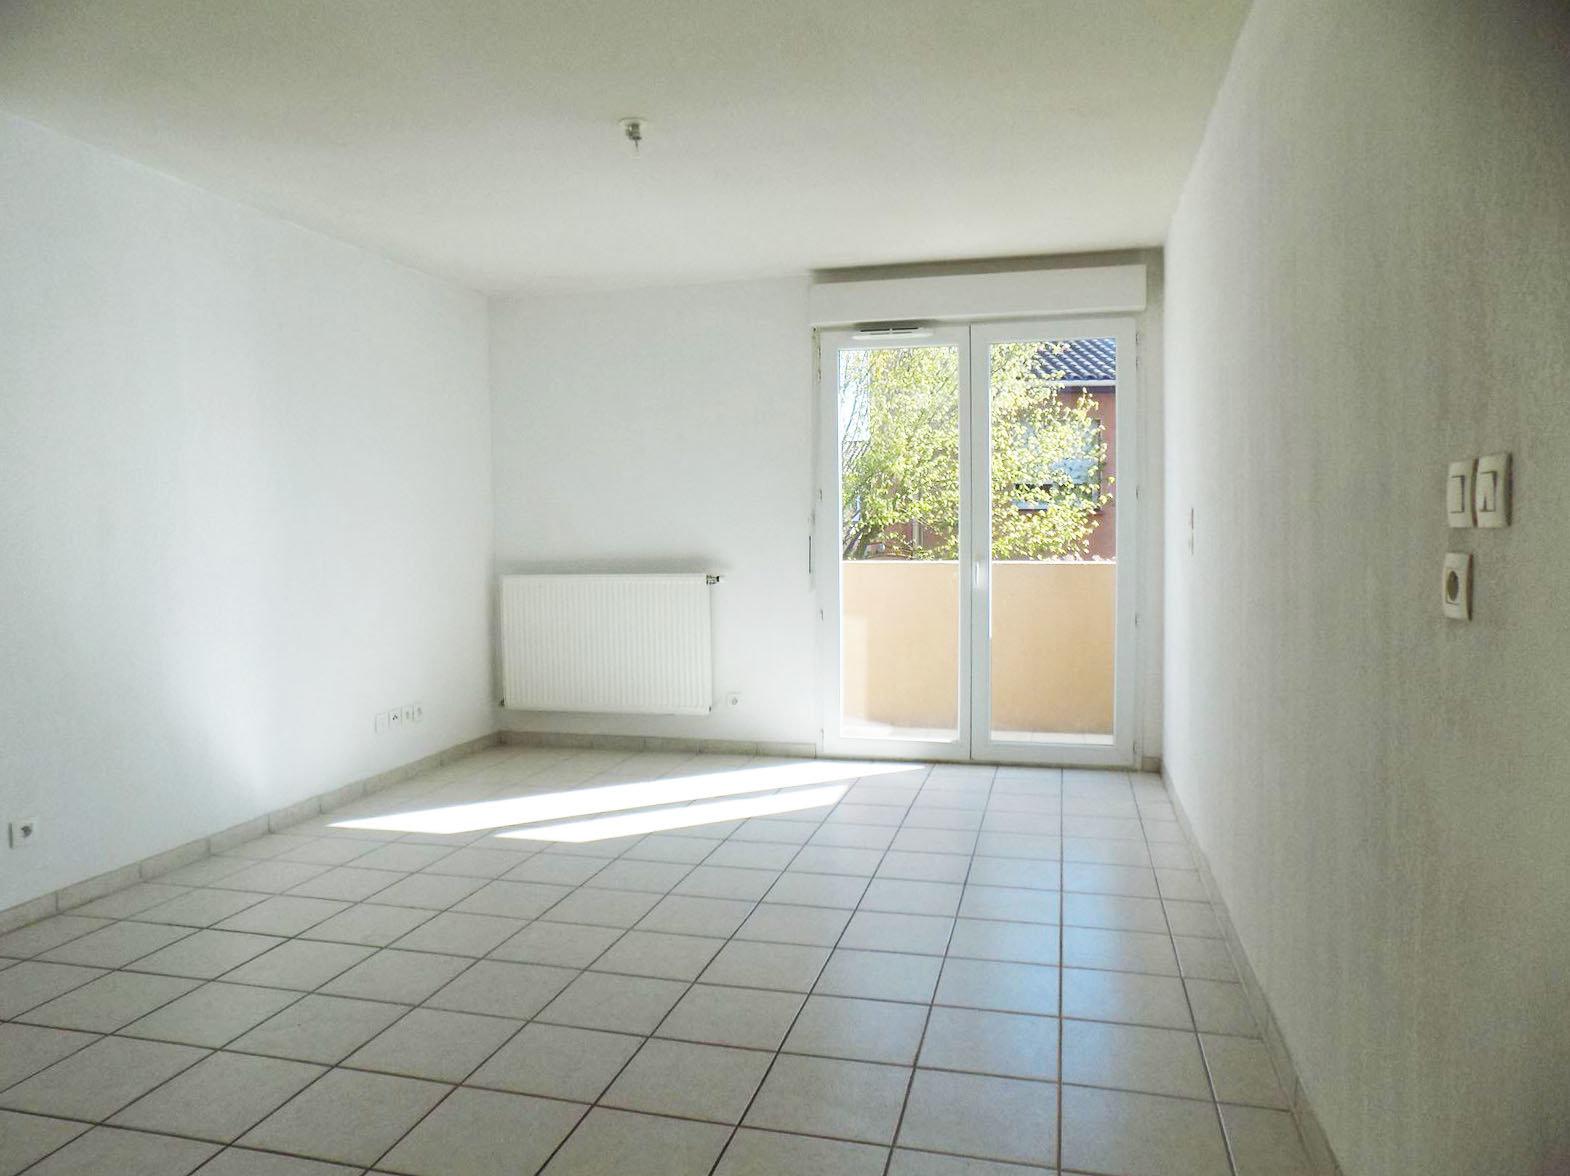 Appartement T2 avec Garage - 31140 AUCAMVILLE